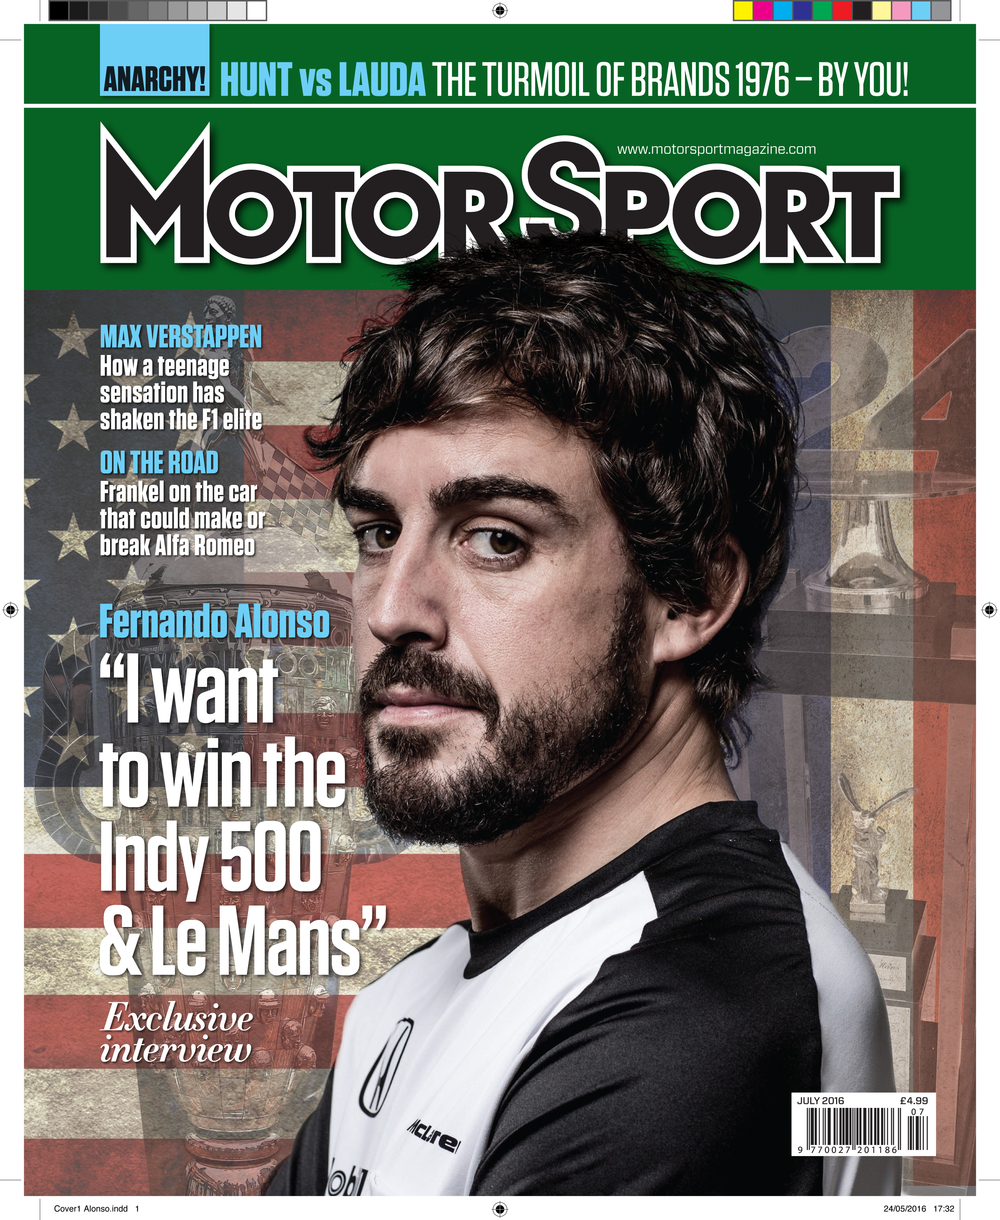 Motorsport July 2016